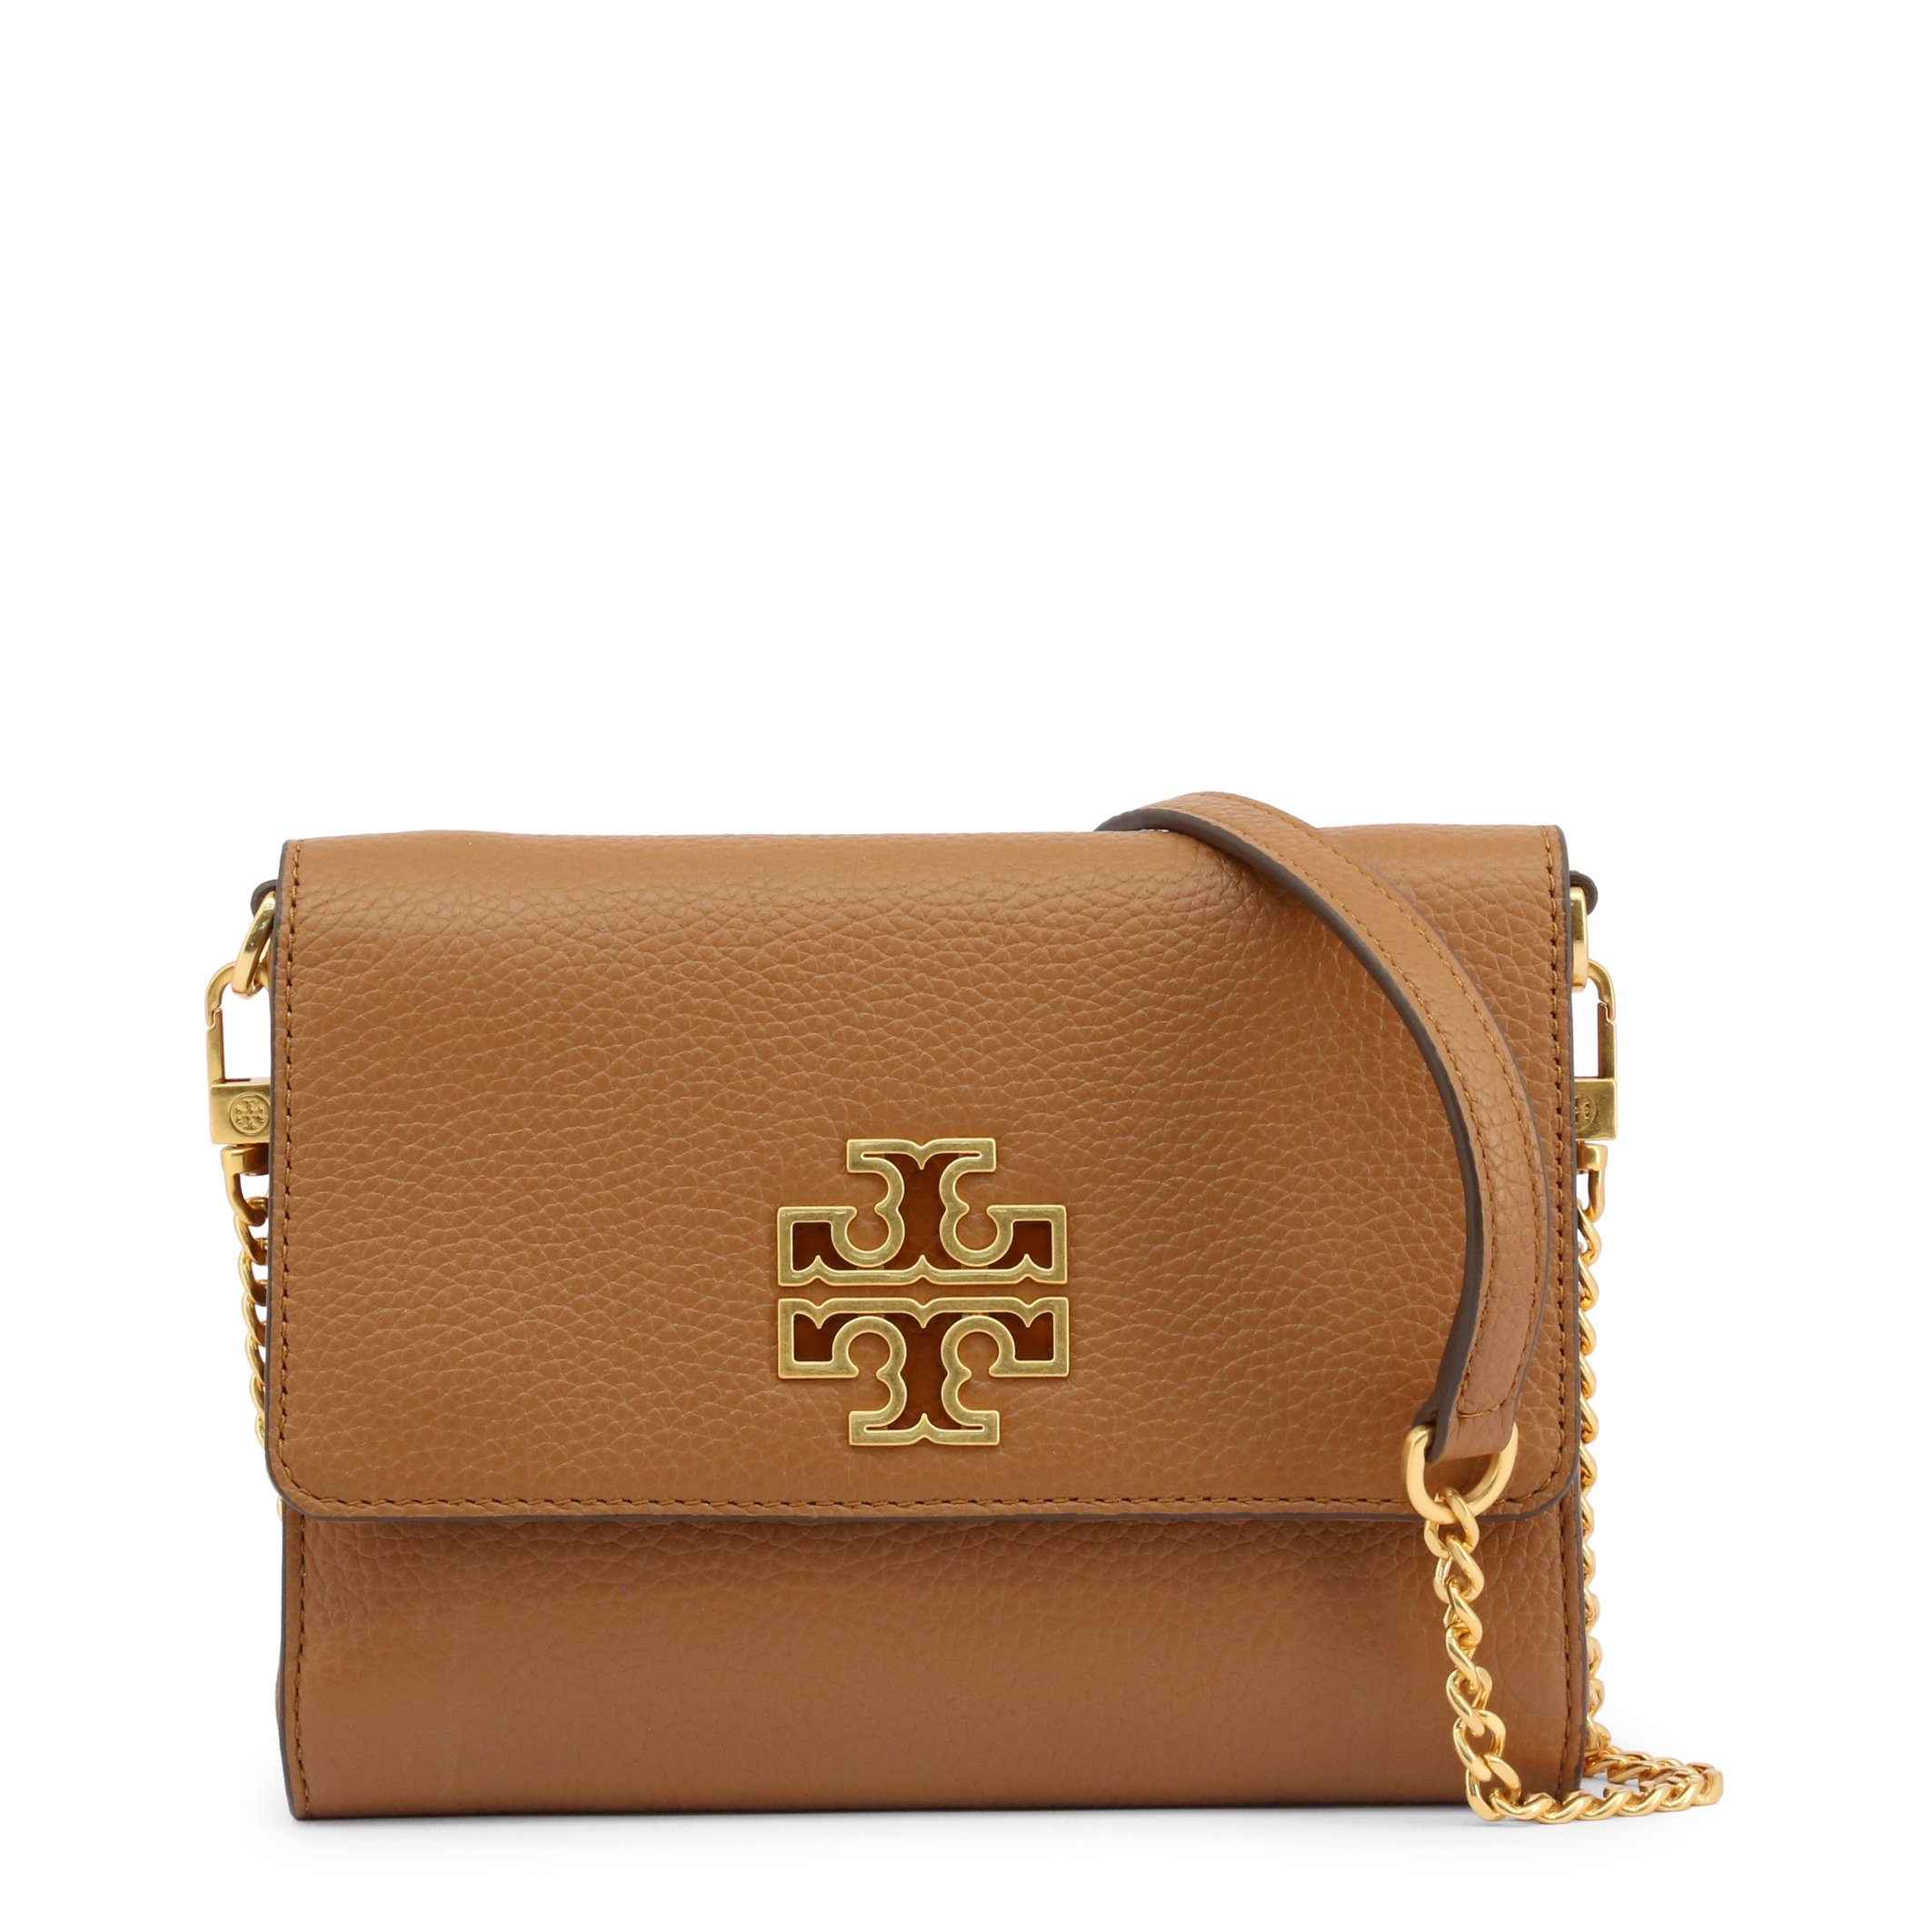 Tory Burch Women's Crossbody Bag Various Colours 67296 - brown NOSIZE